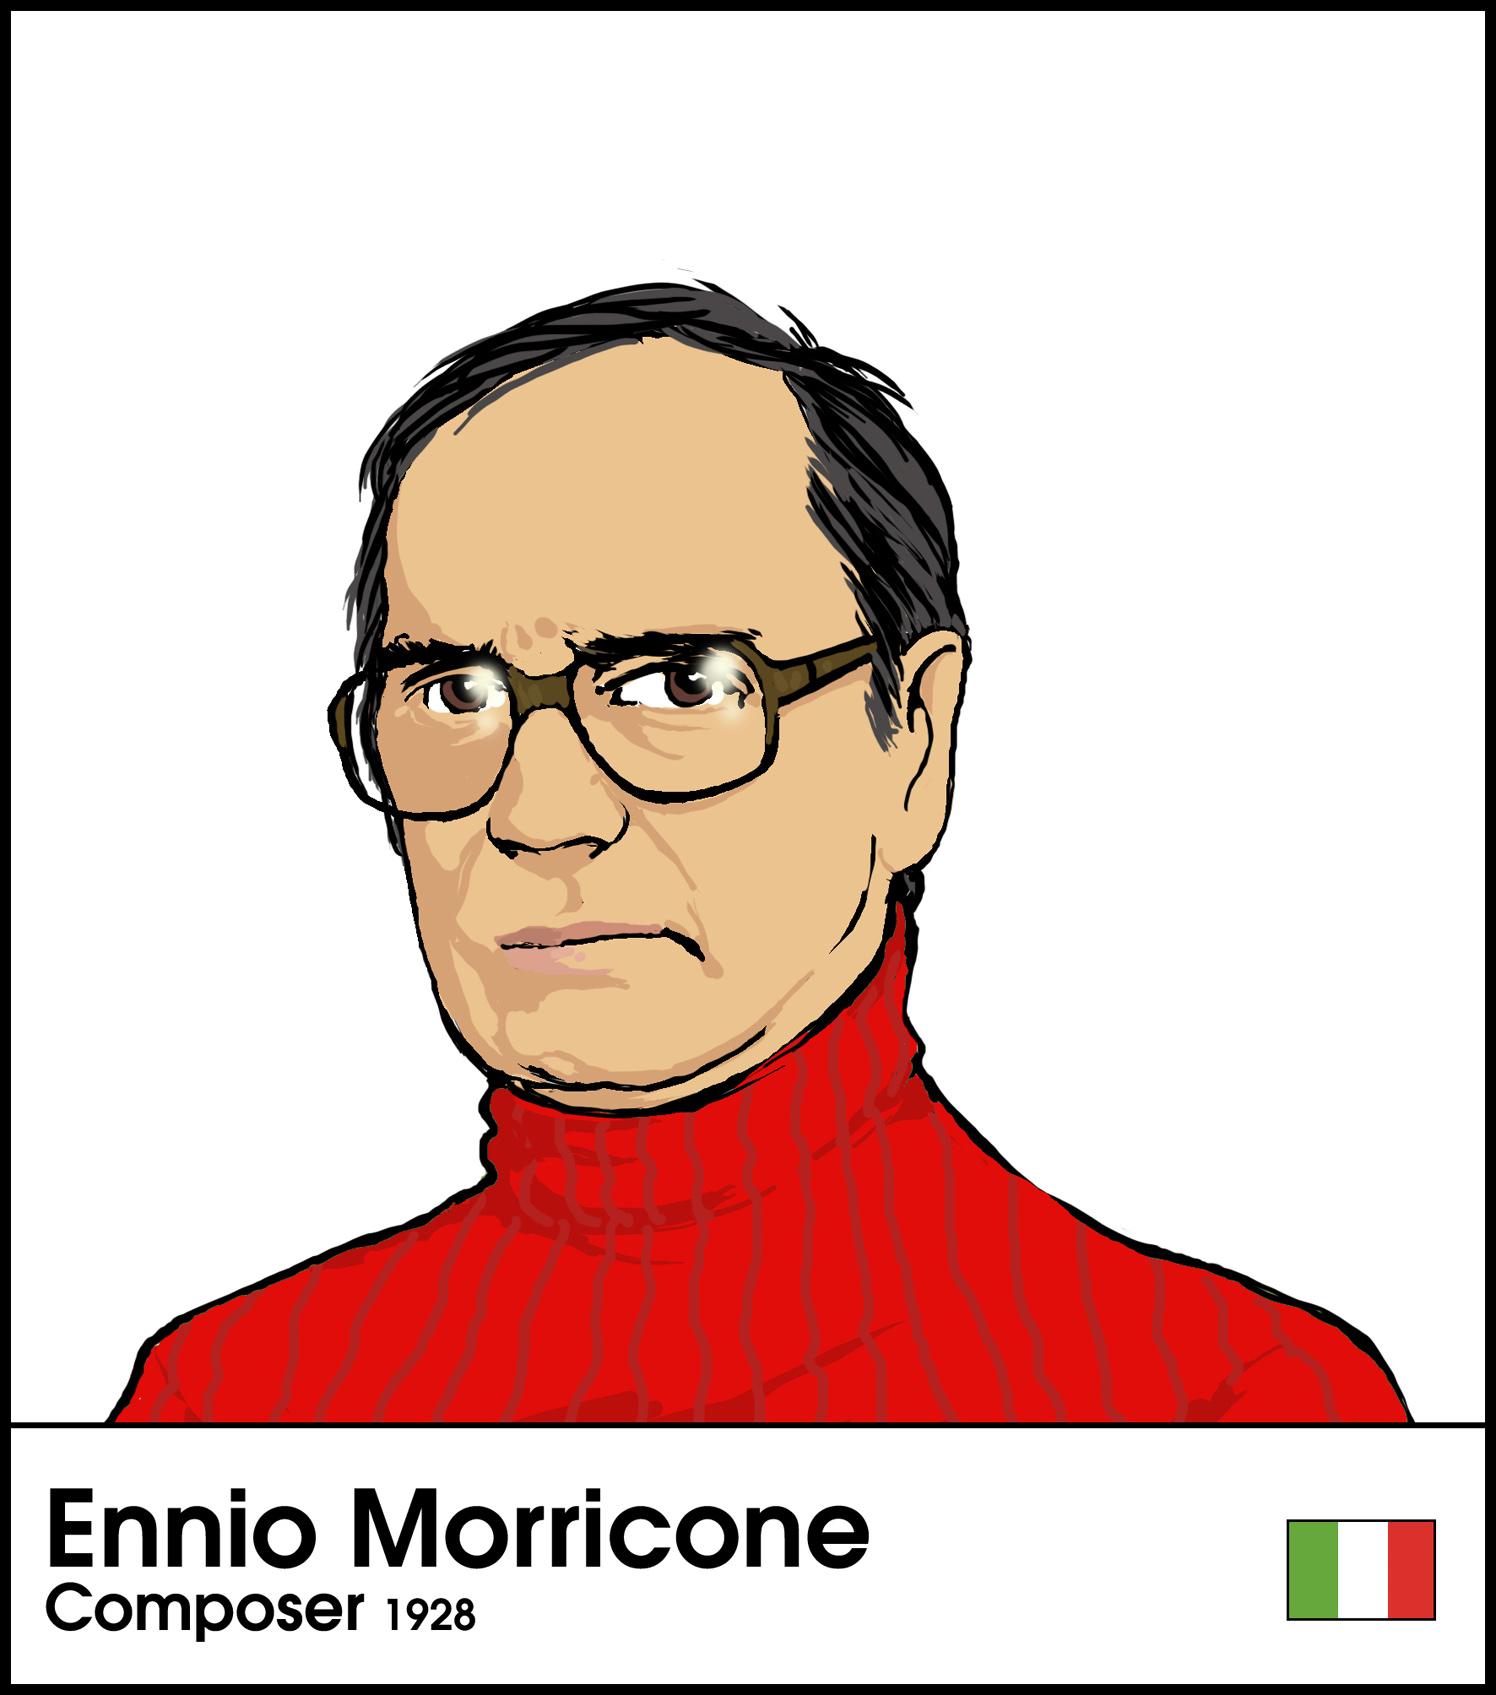 Ennio Morricone Composer 1928